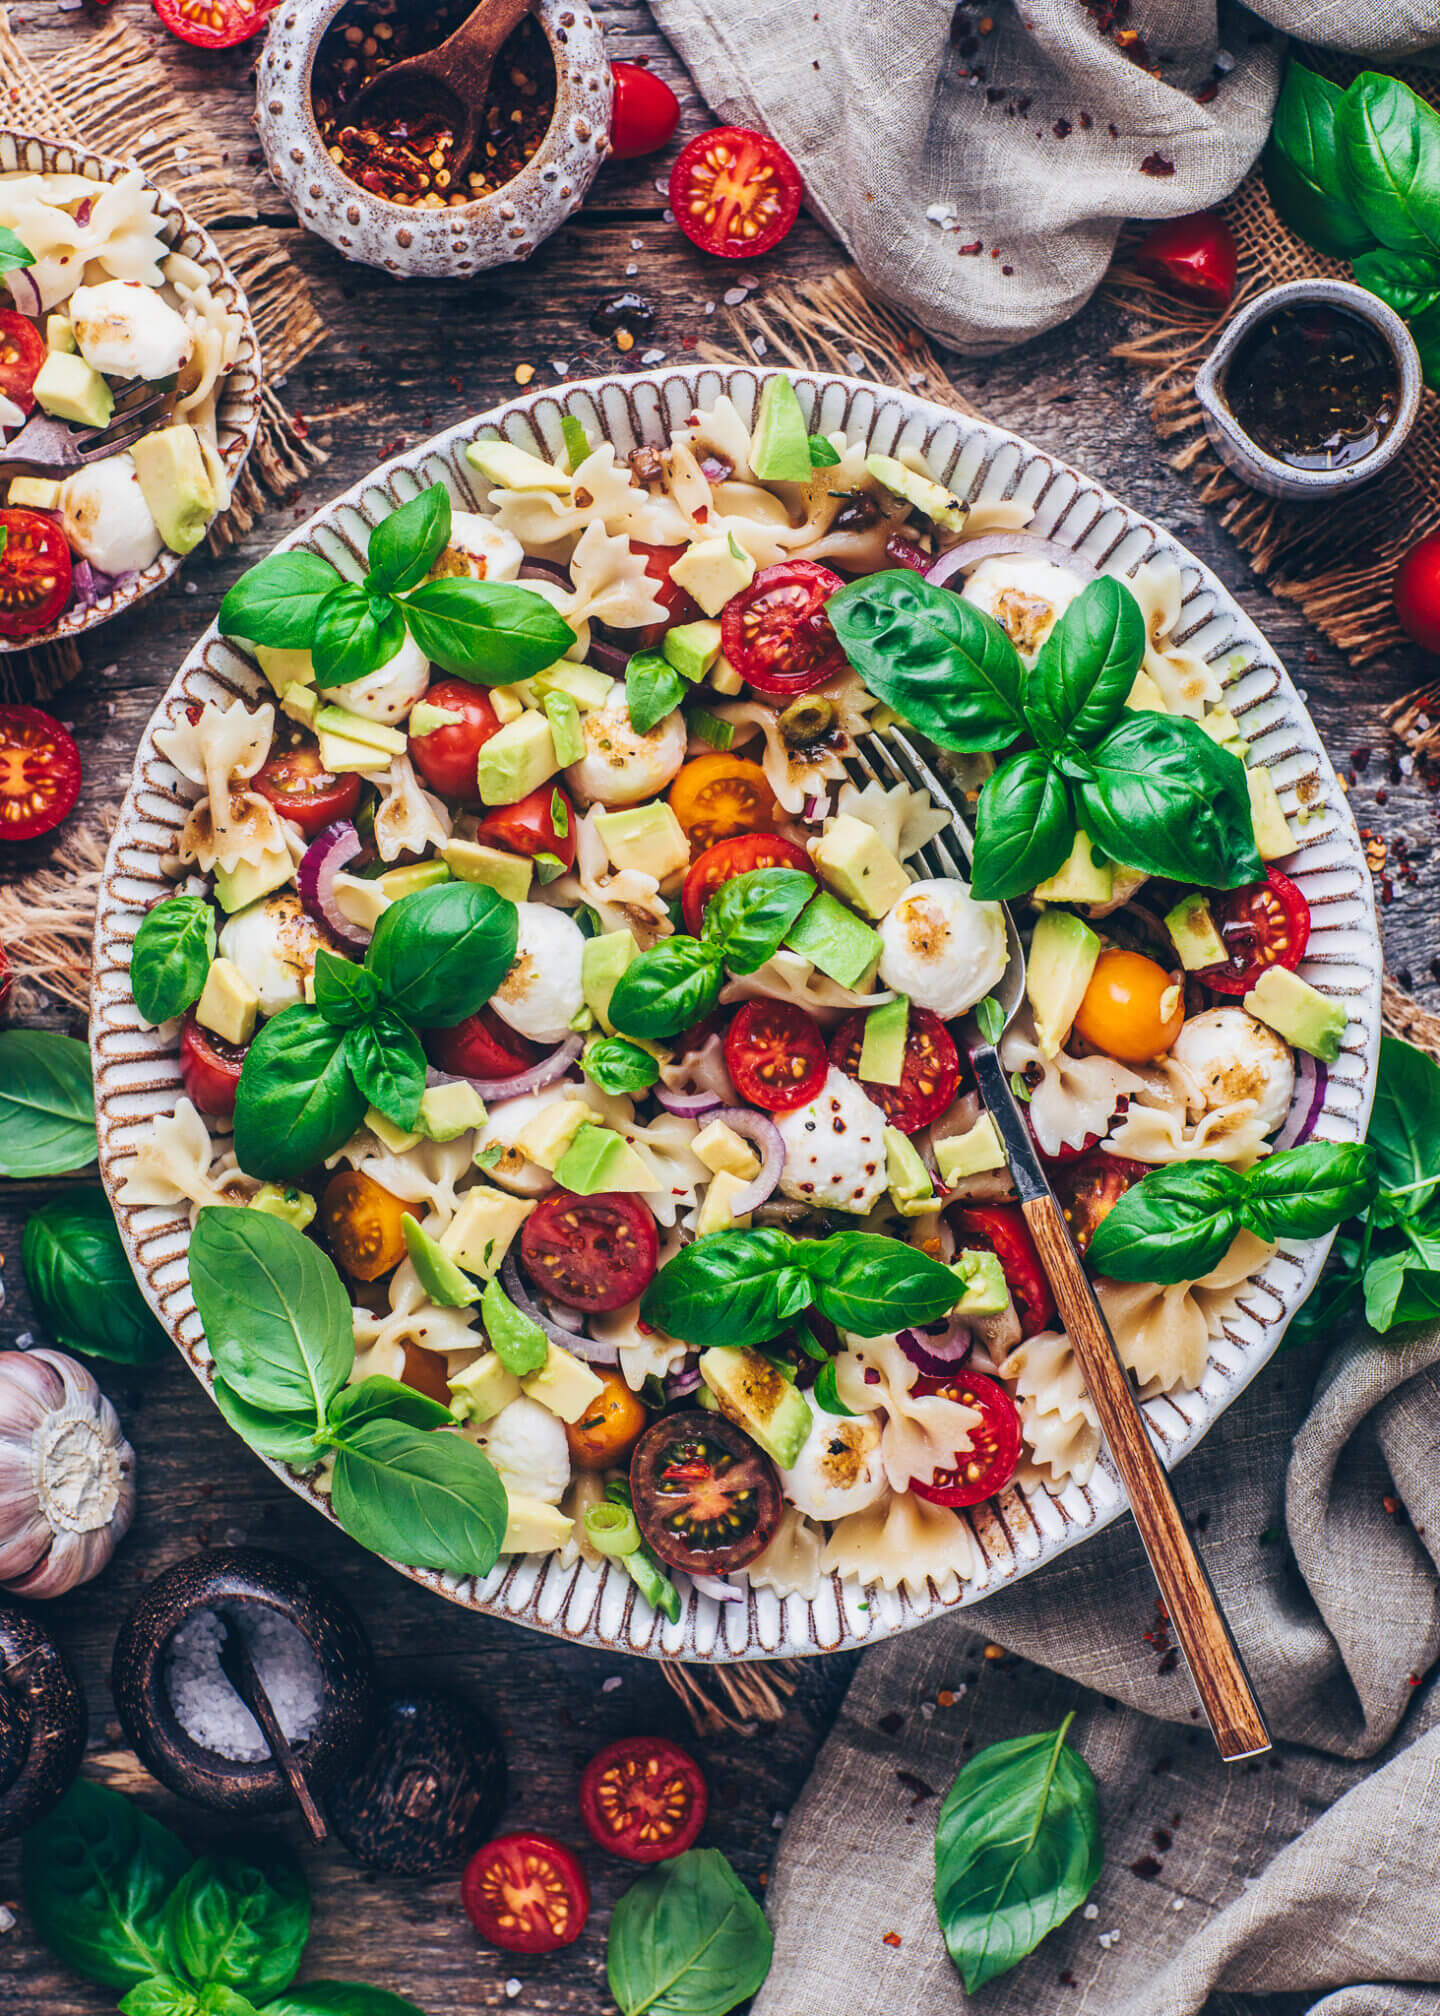 Nudelsalat mit Tomaten, Mozzarella, Avocado, Basilikum und Balsamico-Dressing (Veganer Caprese Pasta Salat)